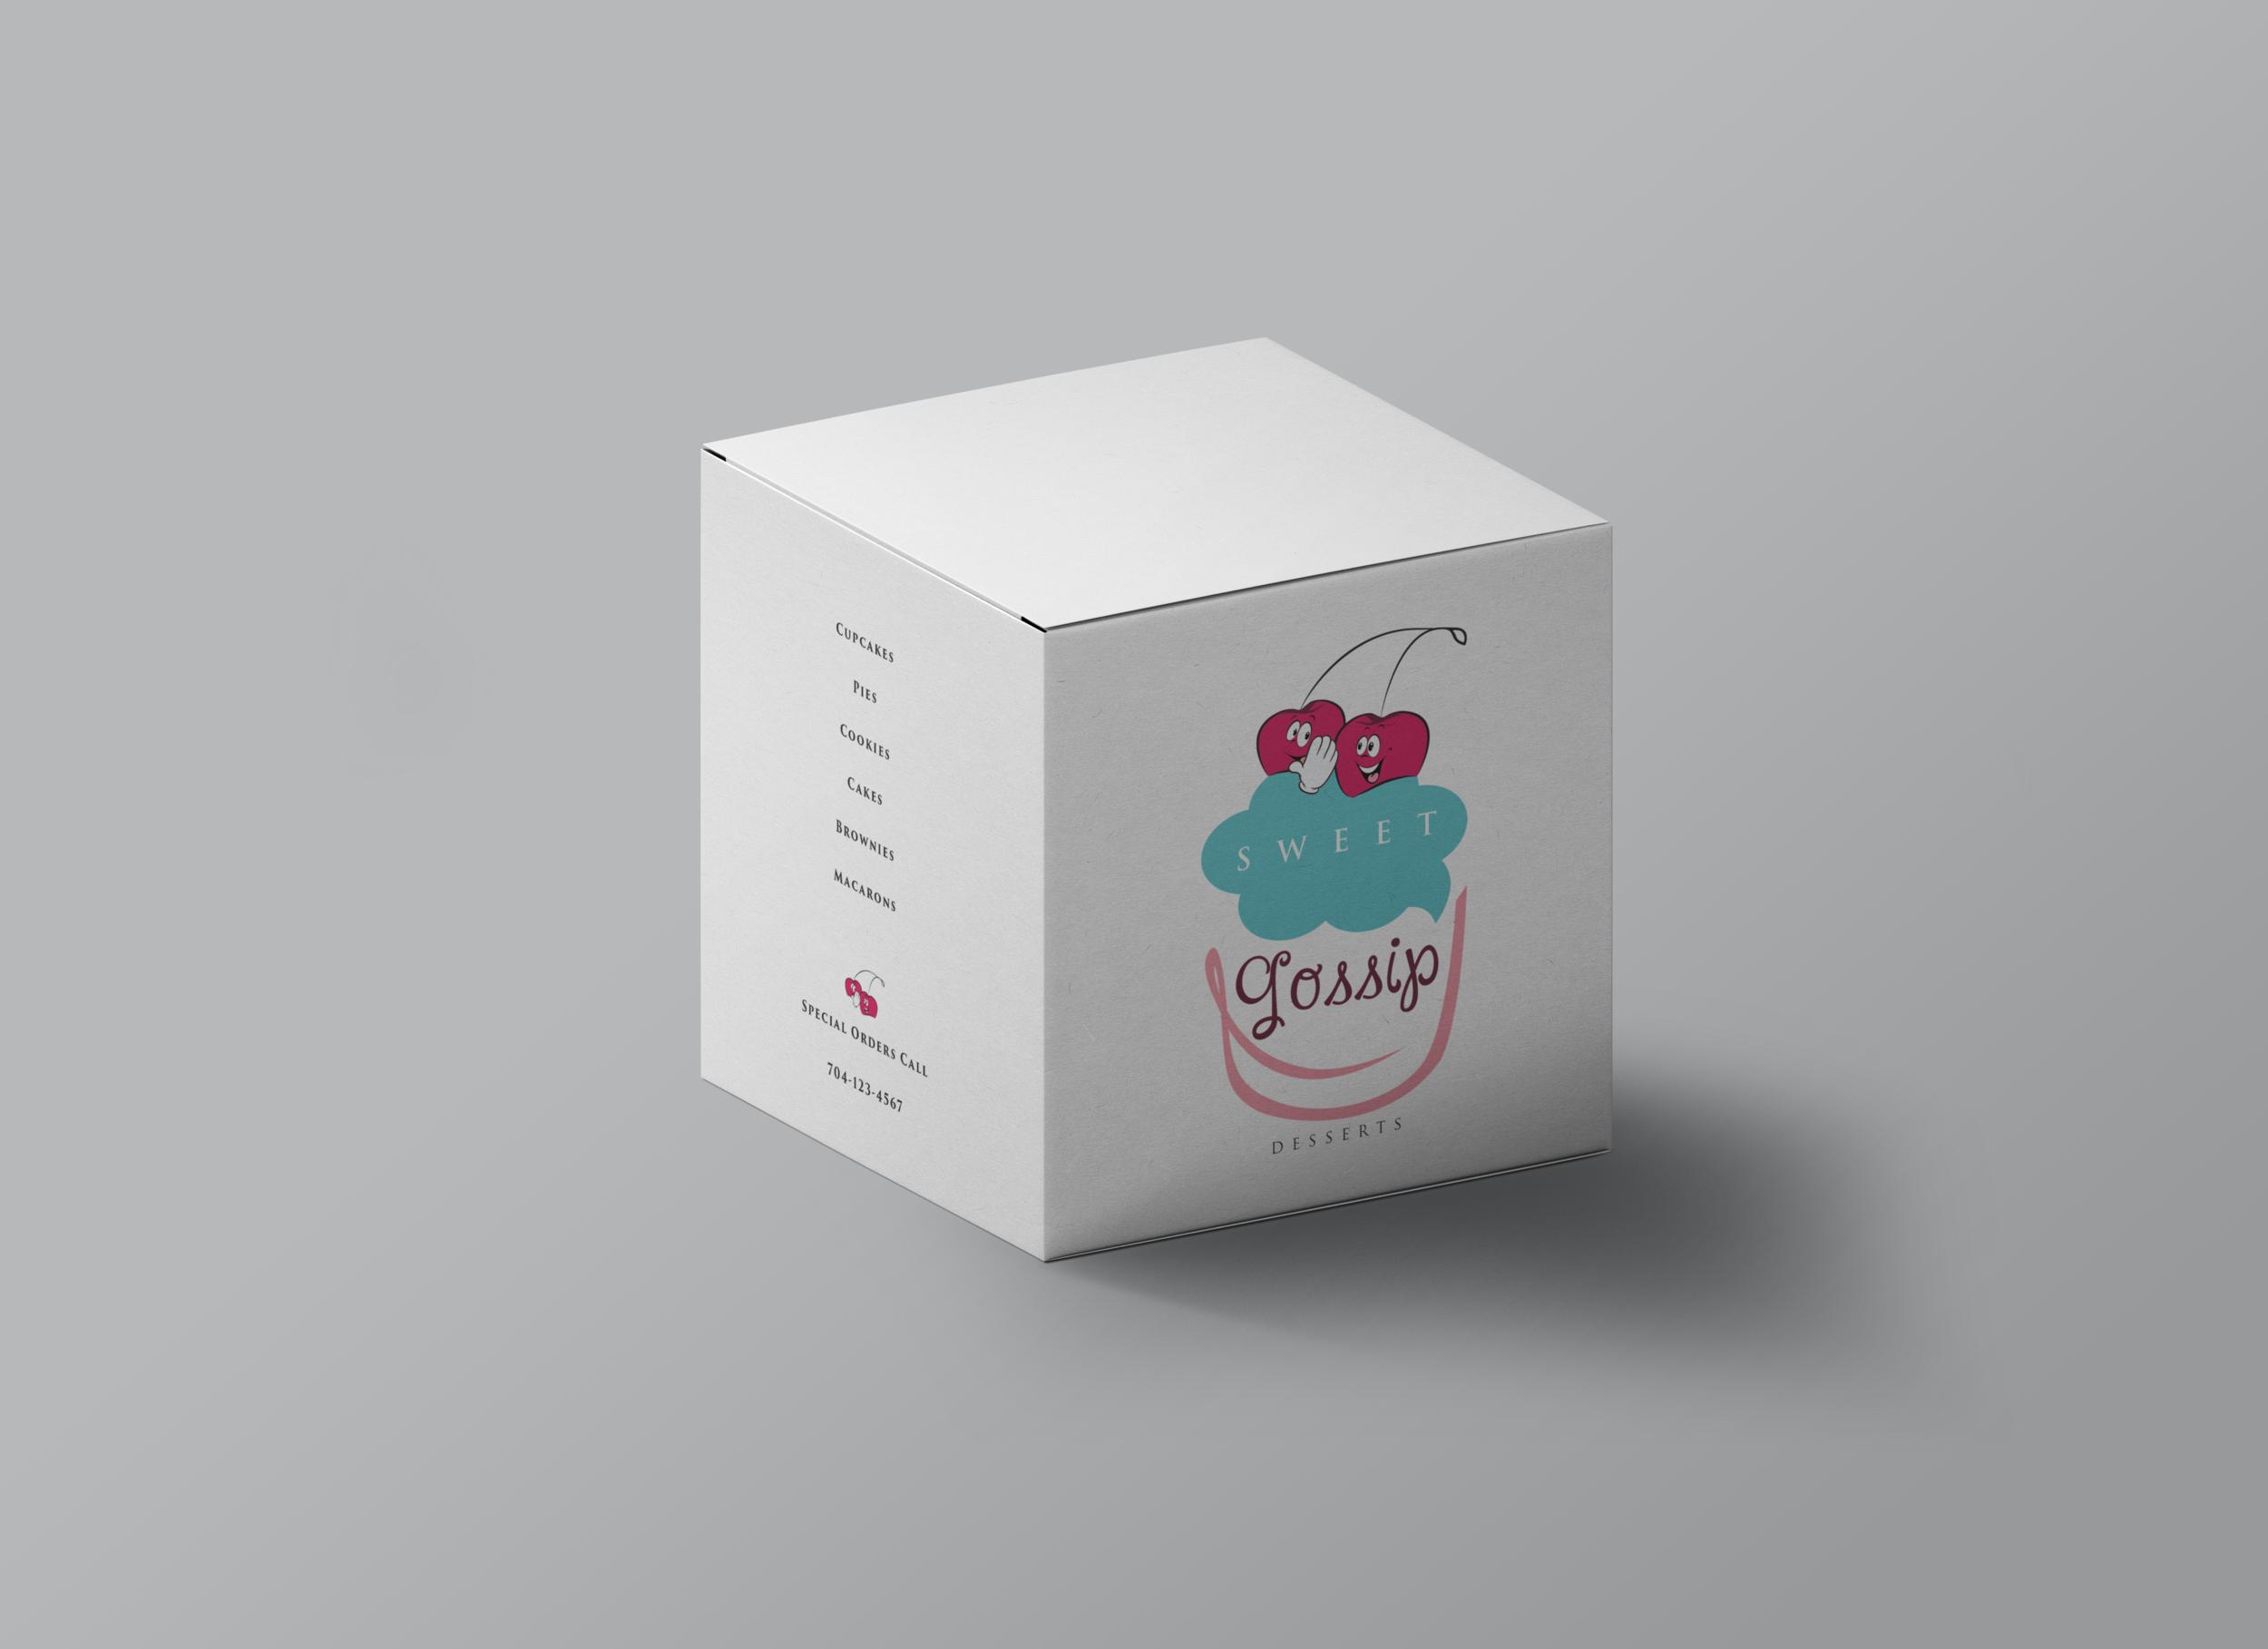 sweet gossip box mockup.png